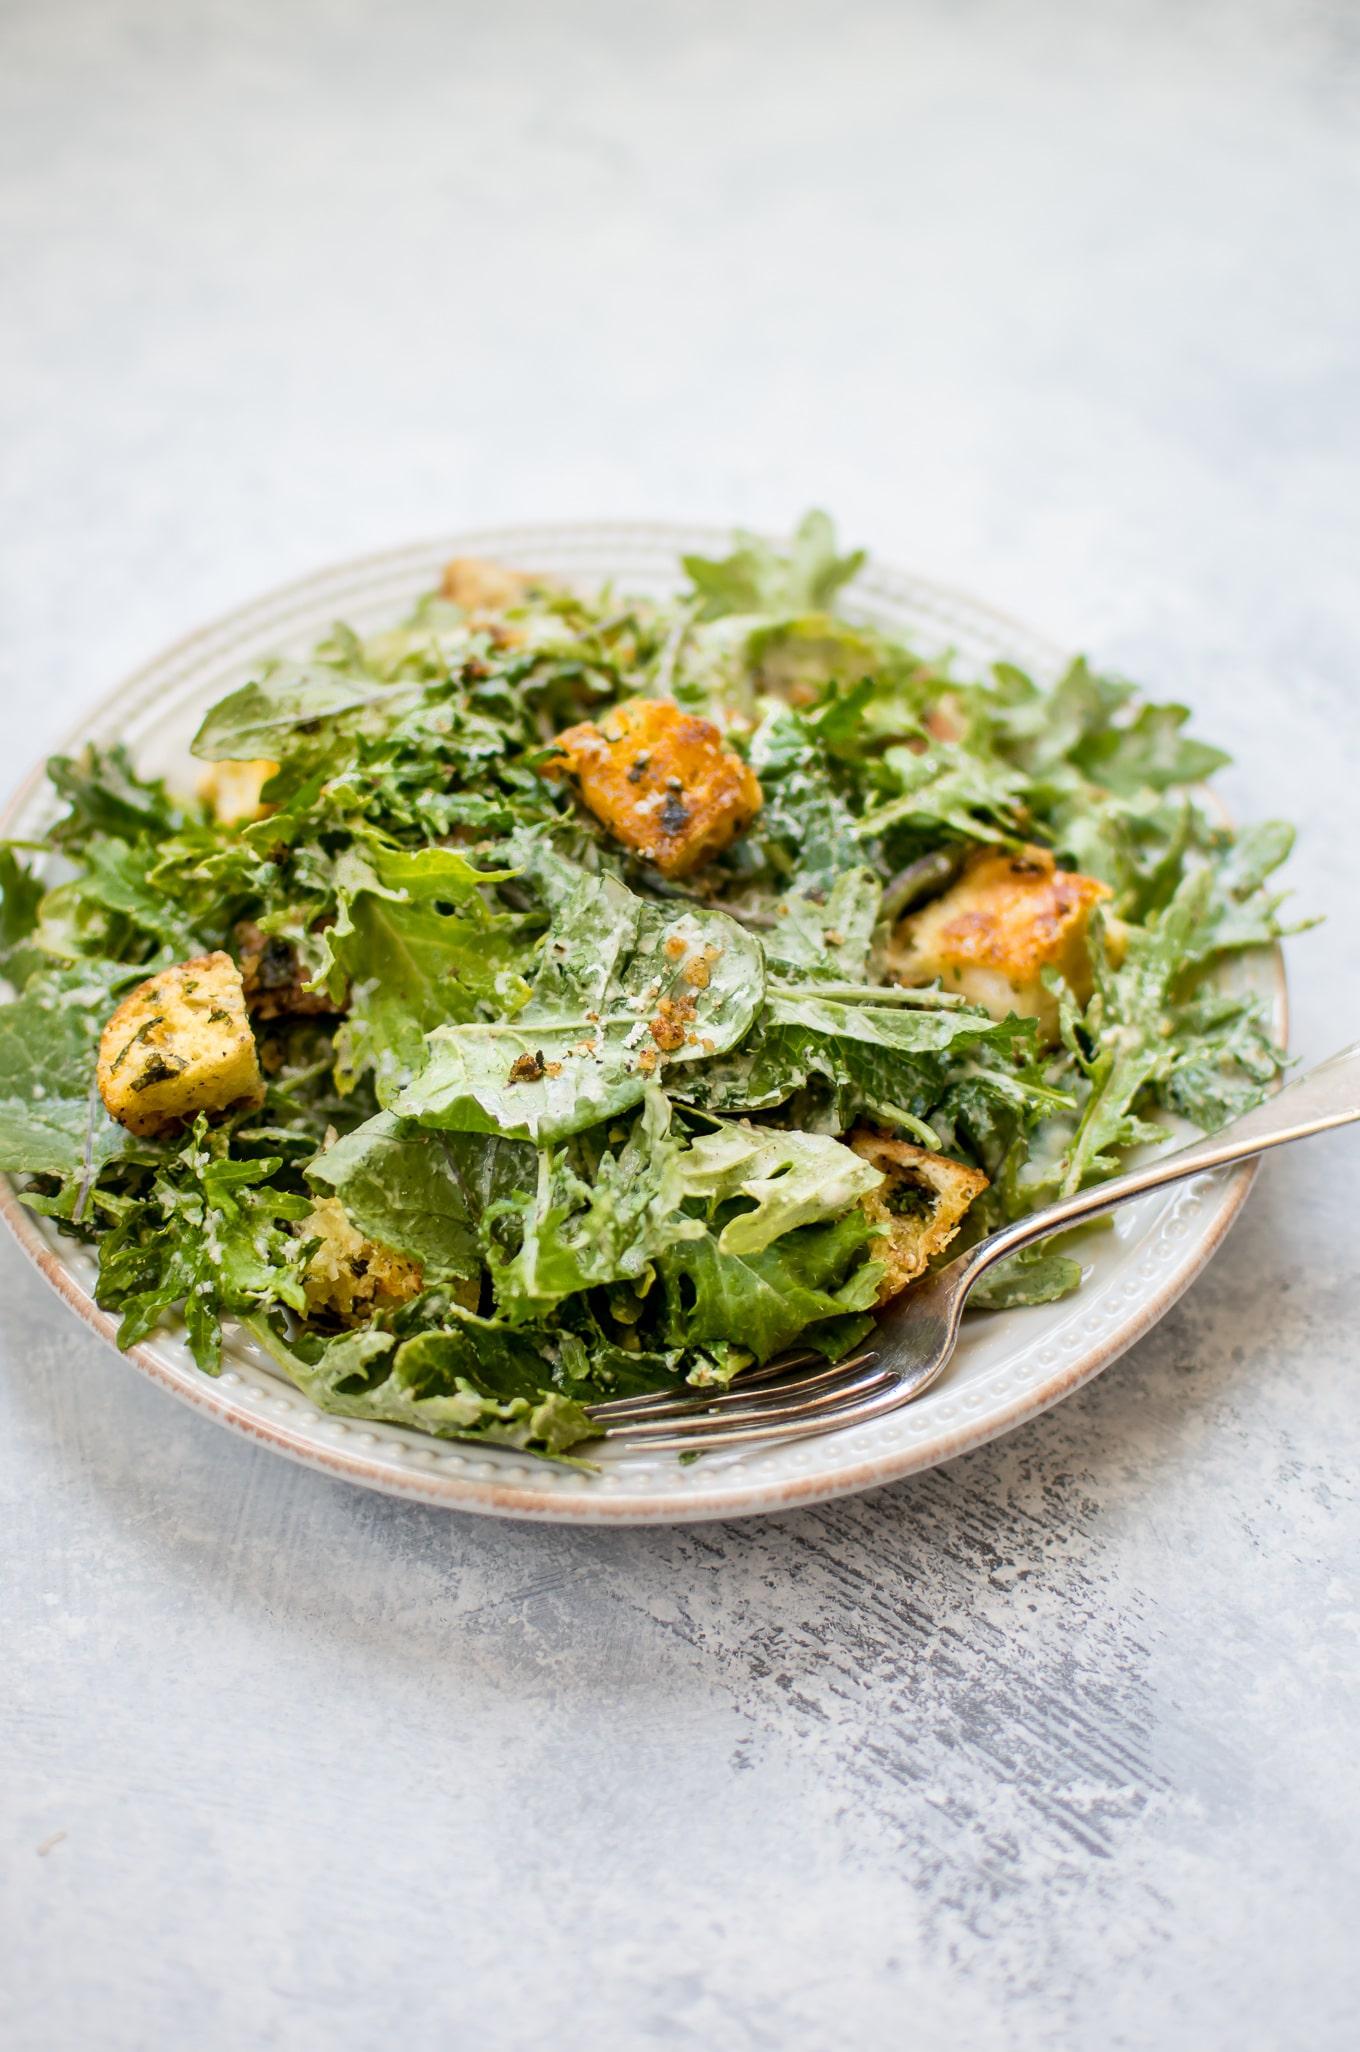 ... Salad with Lemon Dressing and Parmesan Croutons • Salt & Lavender